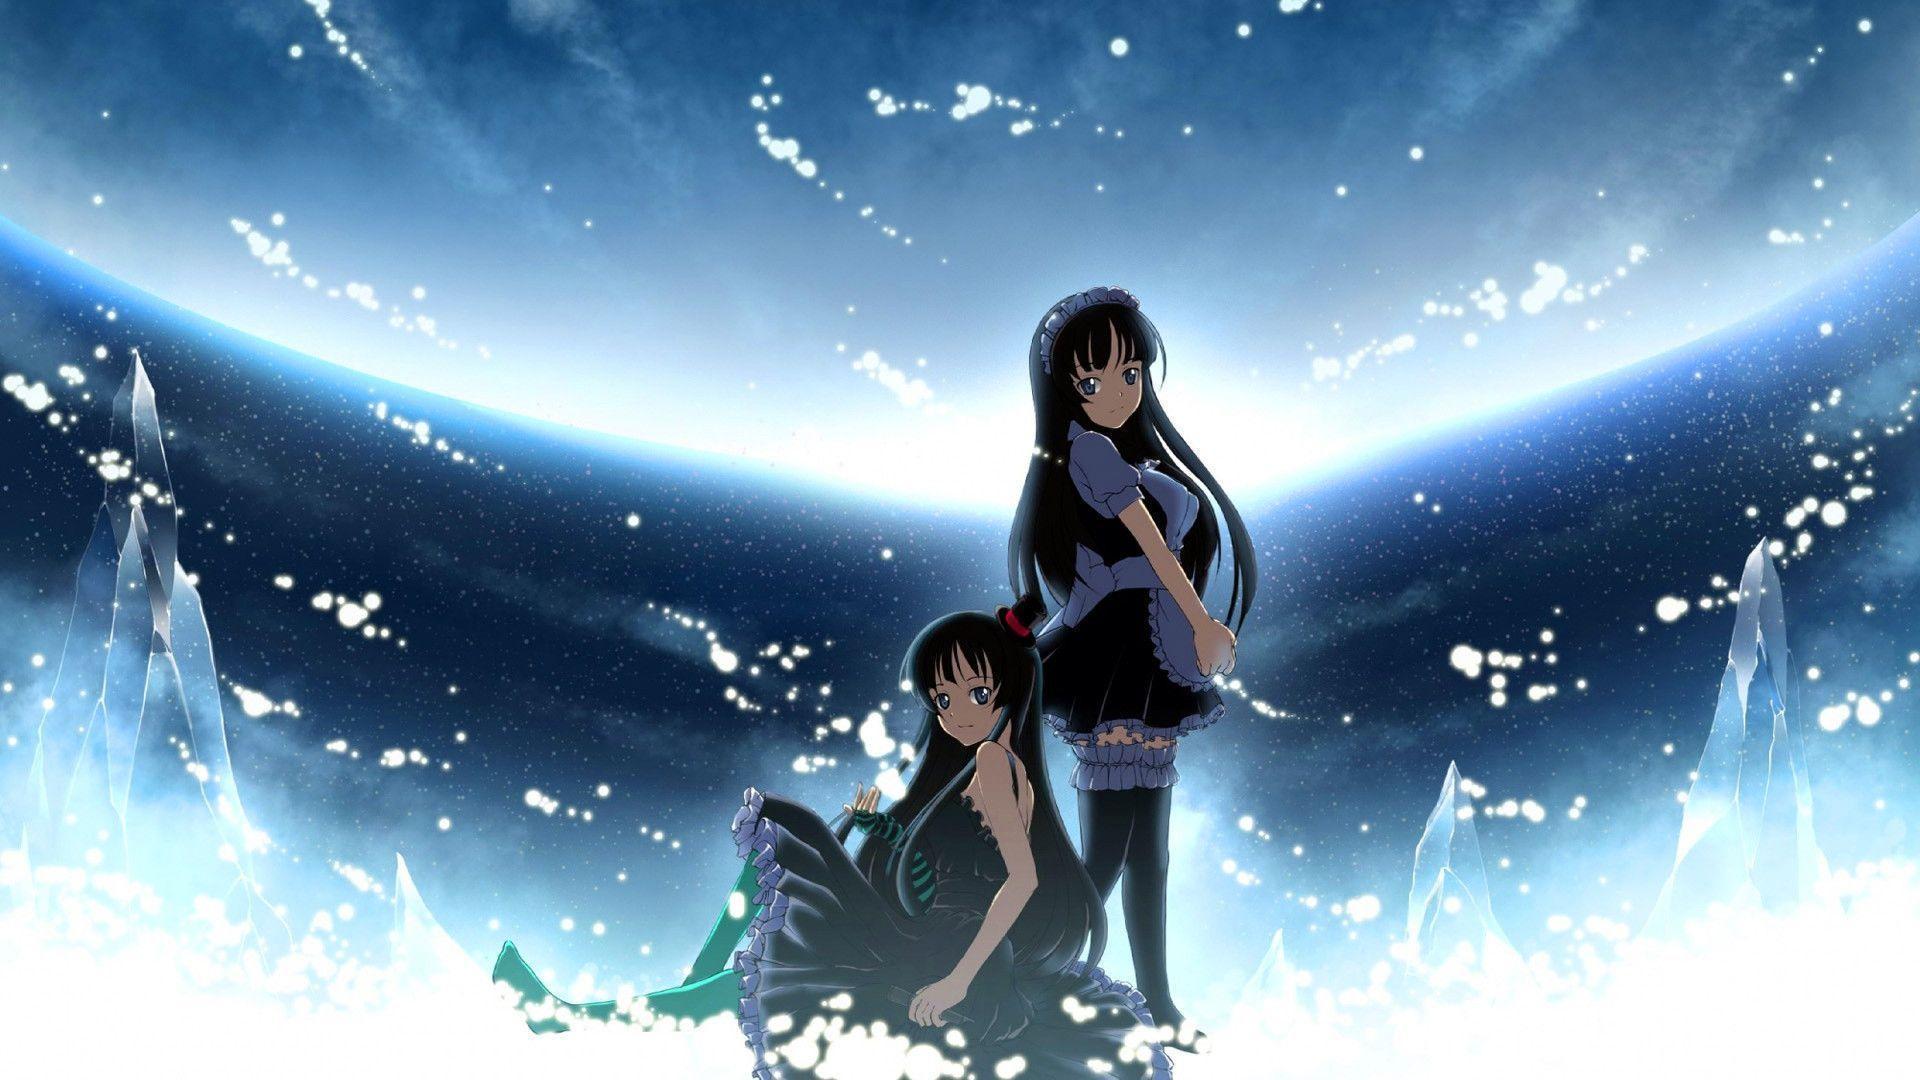 HD Anime Wallpapers 1080p 1920x1080